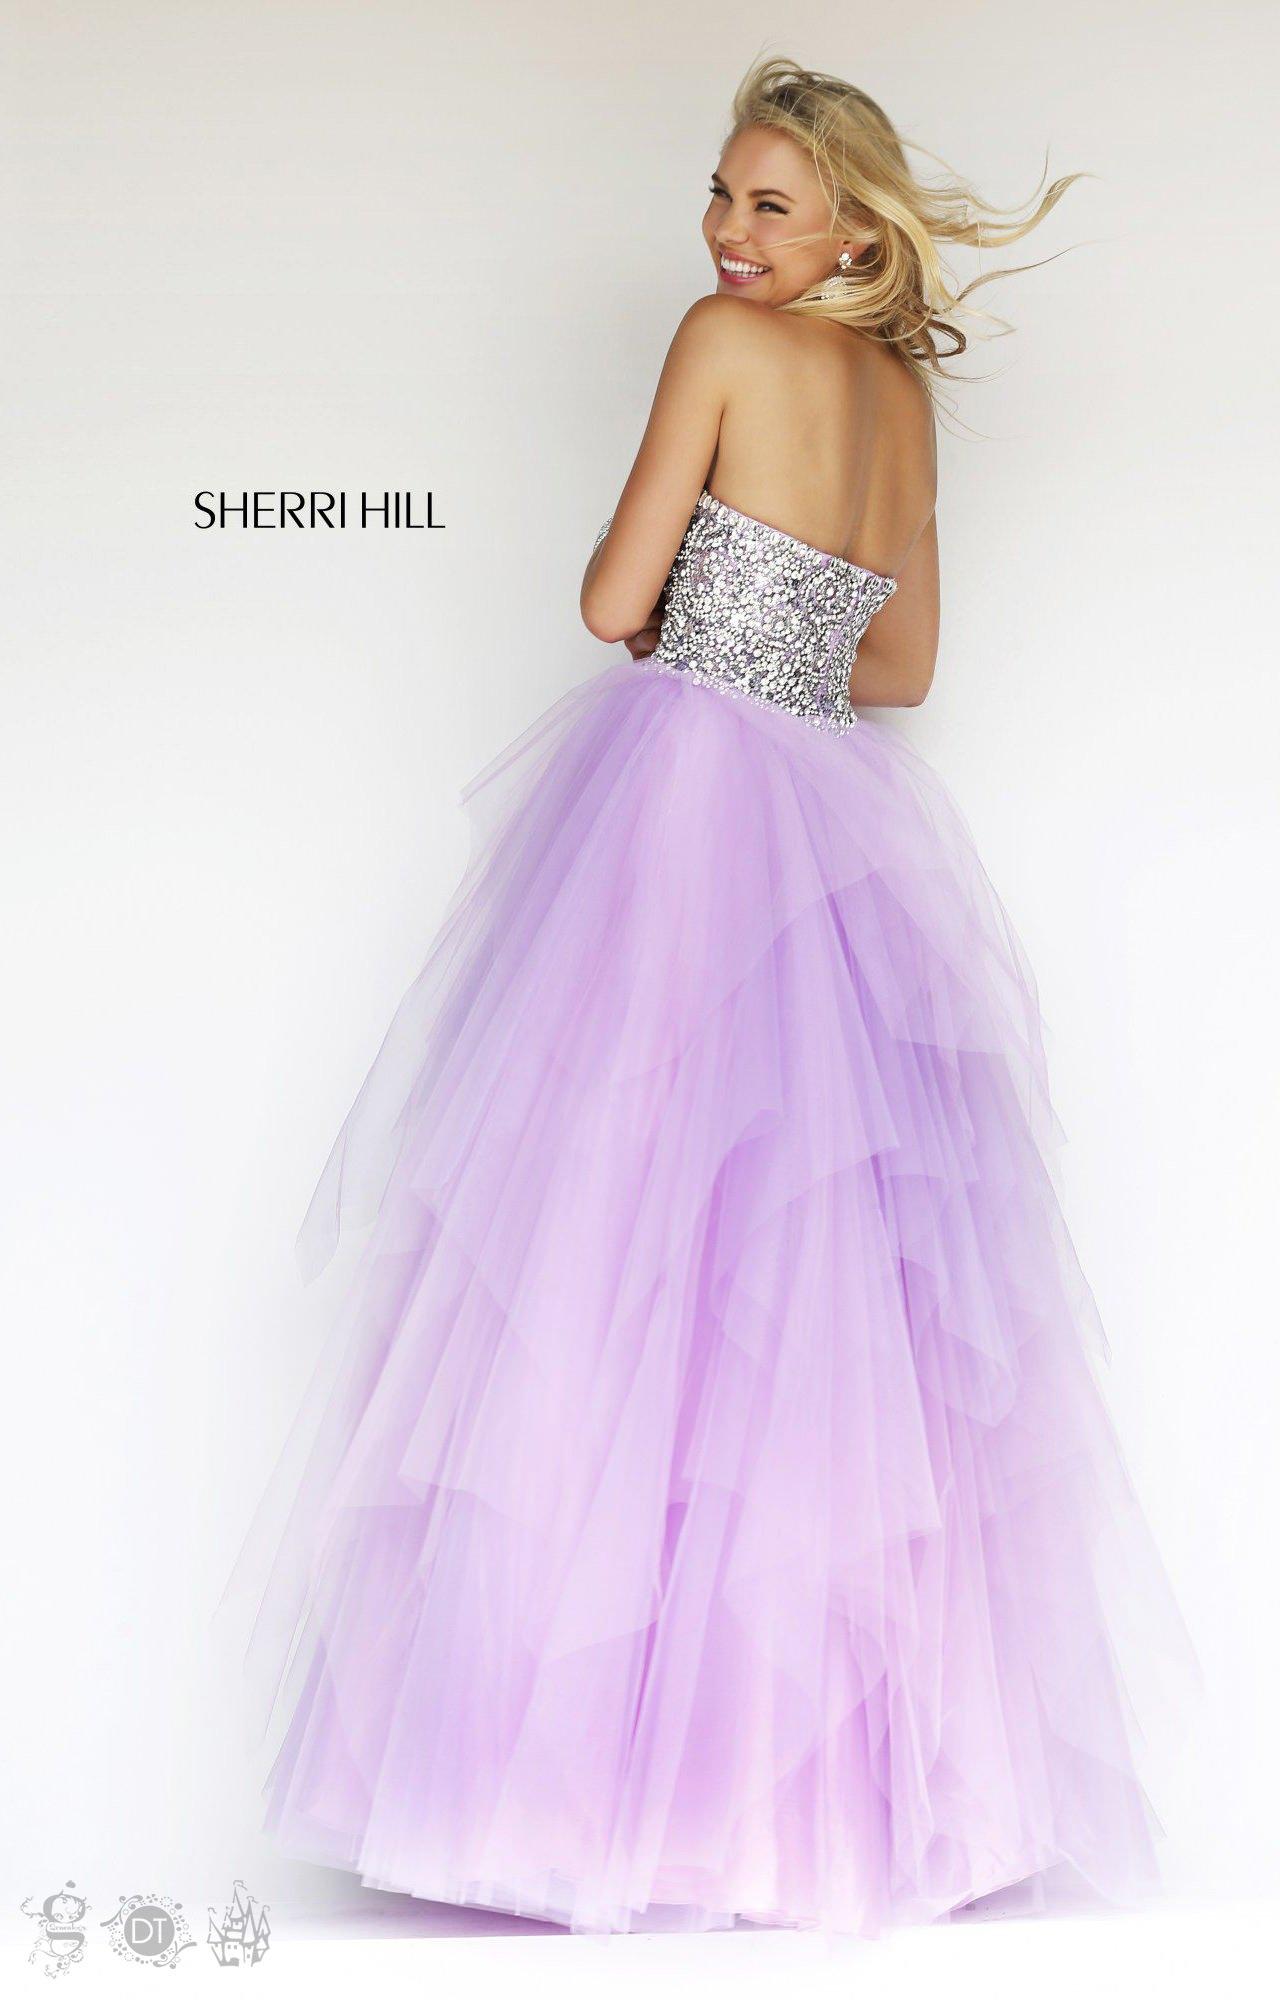 Yellow Mermaid Prom Dresses 2014 Sherri Hill 11085 - St...